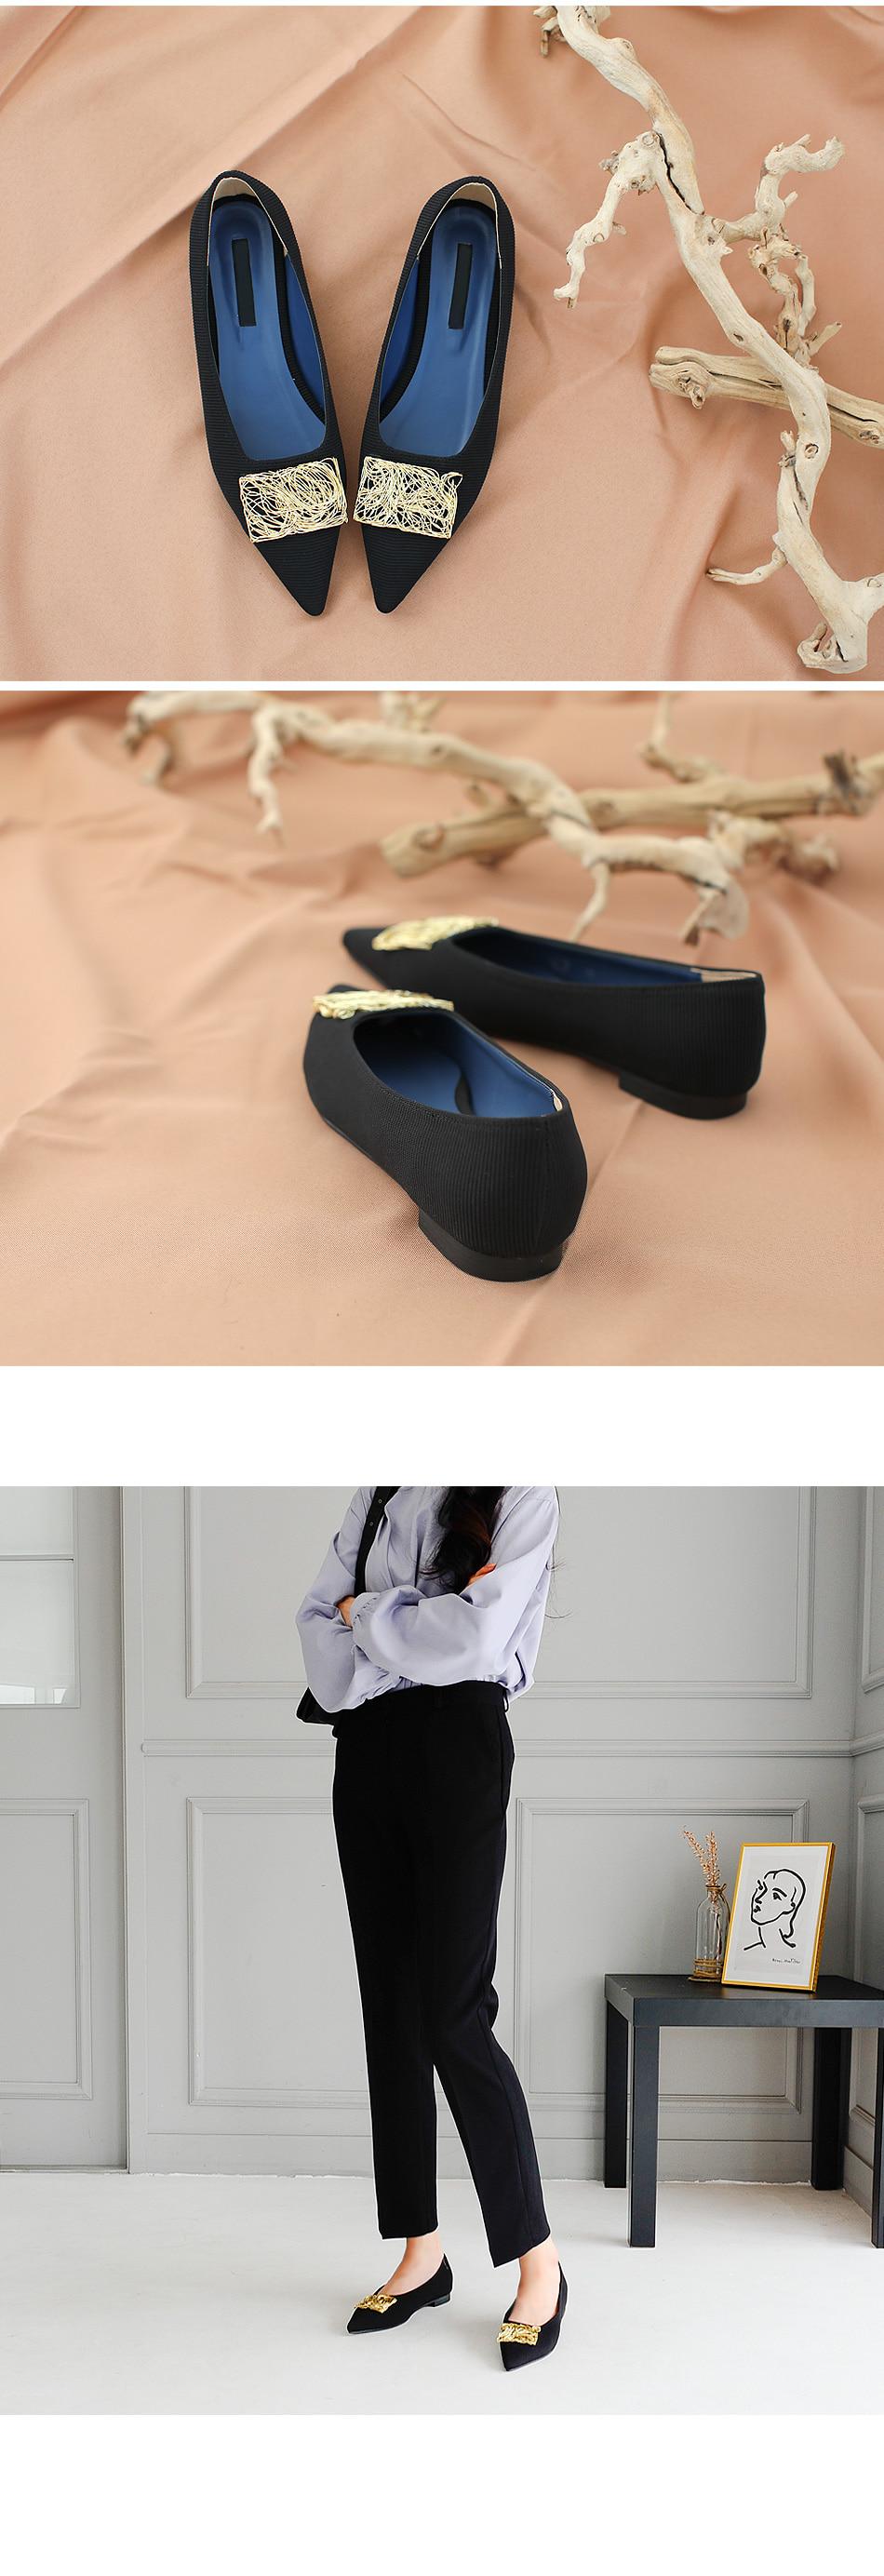 Bellows Flat Shoes 1cm